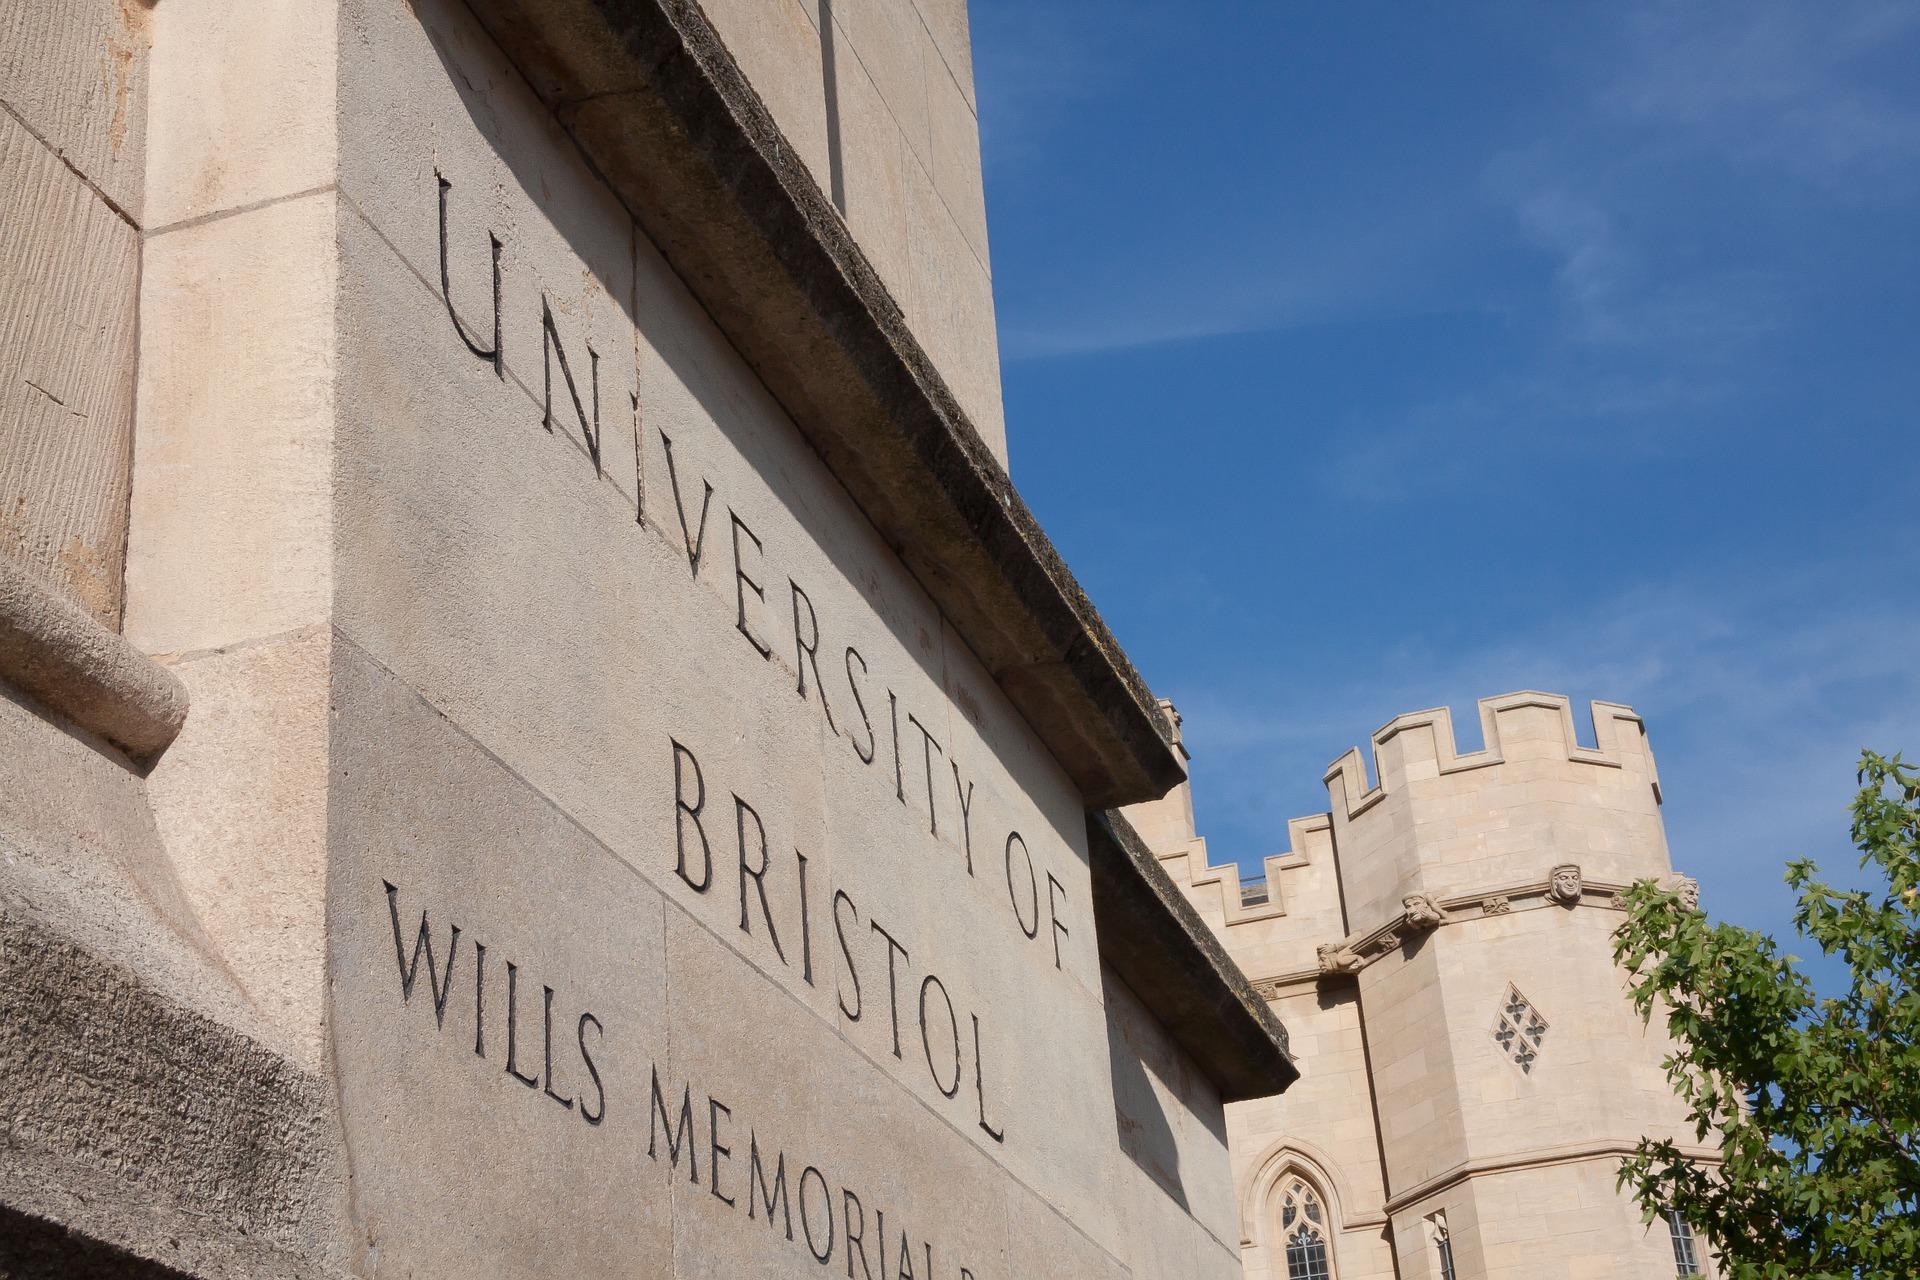 University of Bristol, Architecture, Bristol, Construction, Memorial, HQ Photo